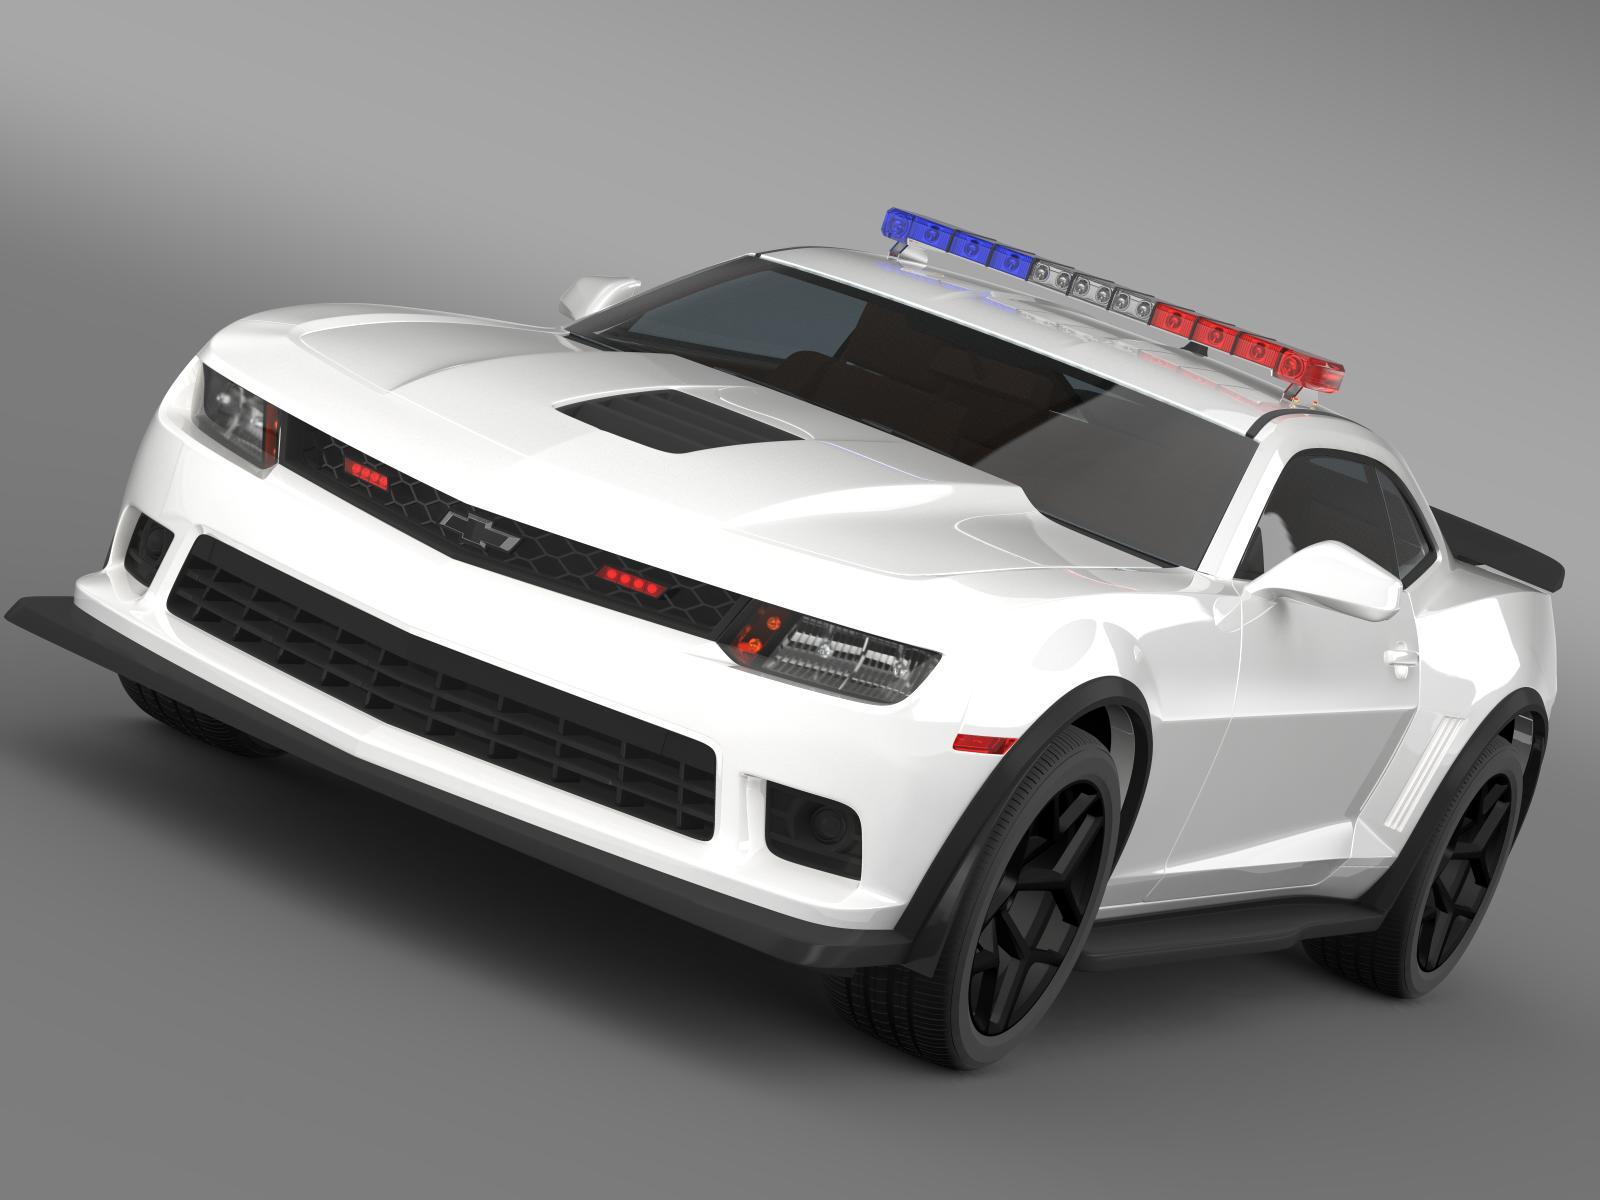 chevrolet camaro z28 policia 2015 3d model 3ds max fbx c4d lwo ma mb hrc xsi obj 203451